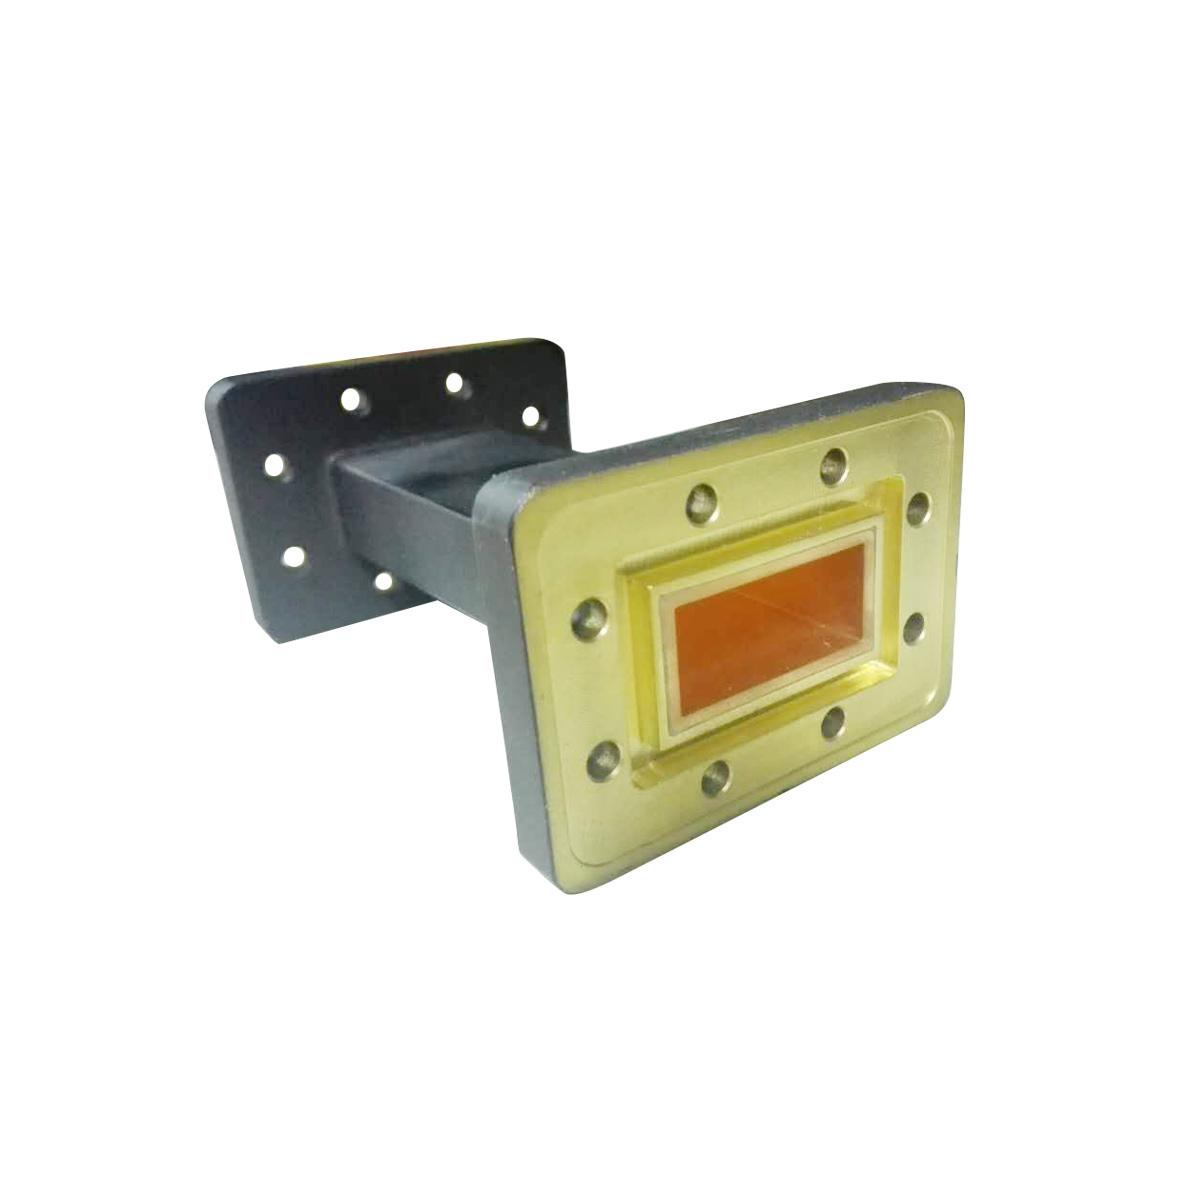 硬波导WG516058 [5.82 - 8.20GHz] PDR/UDR/FDM70/FDP70